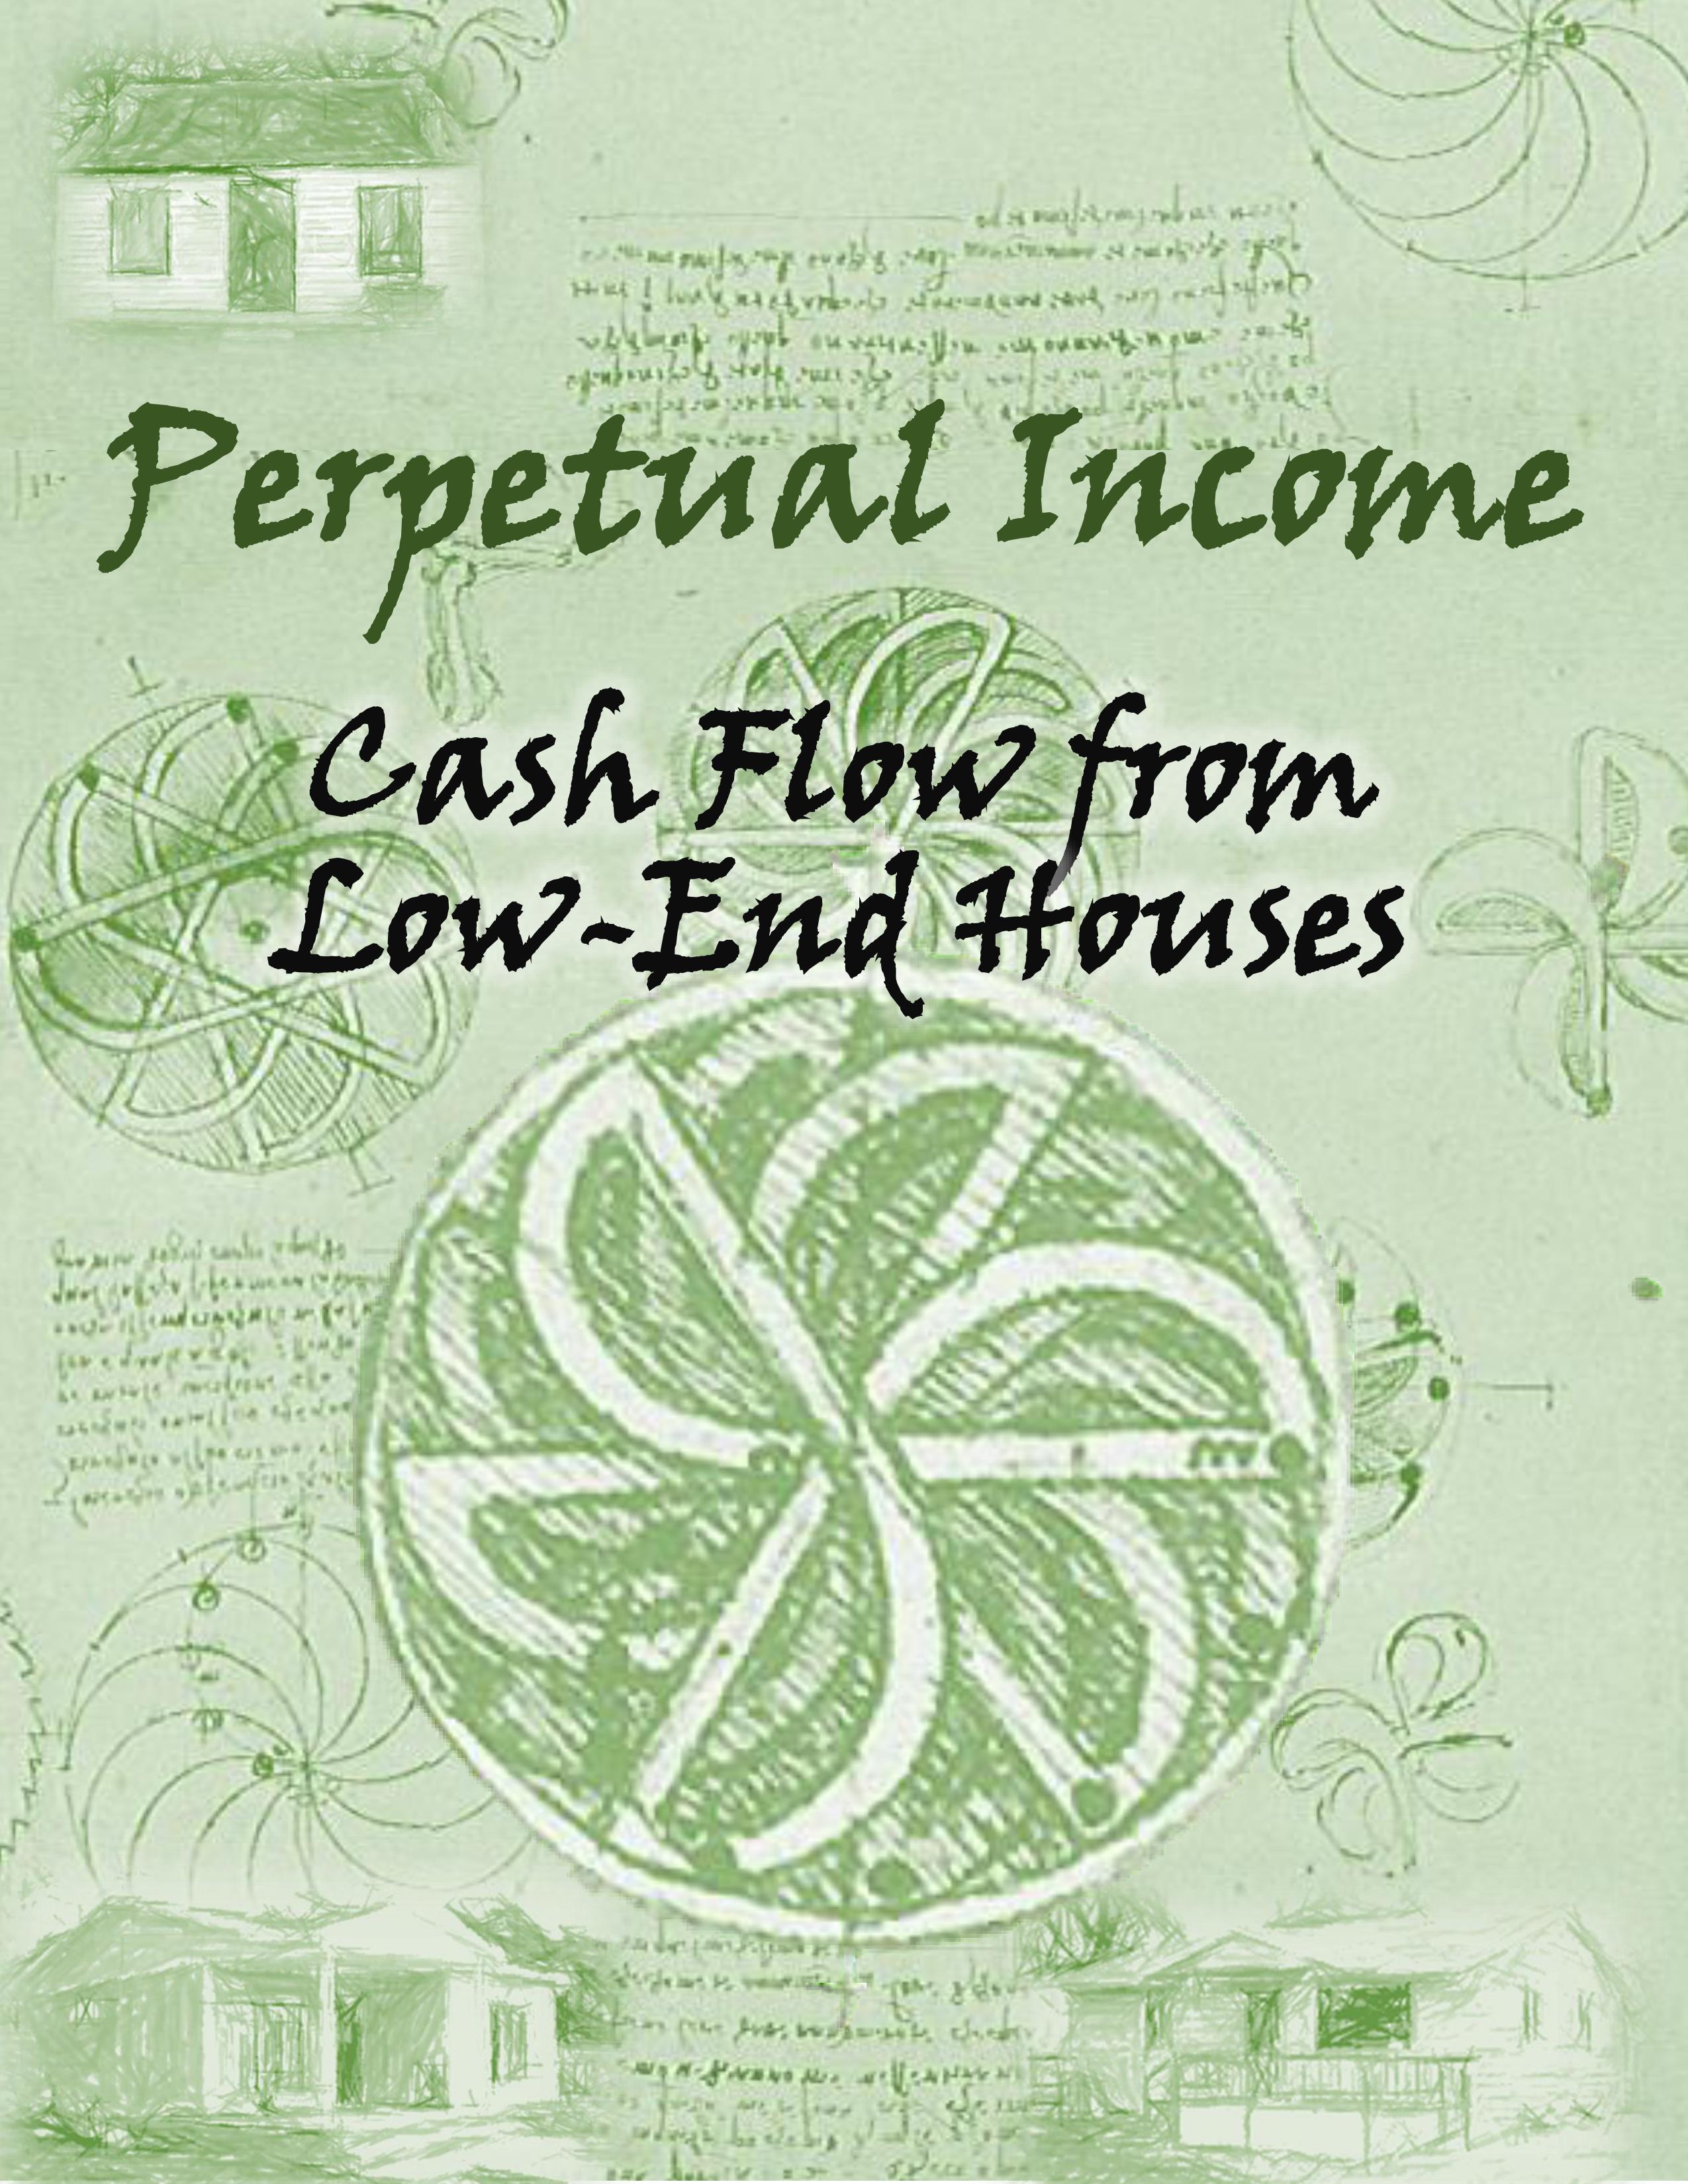 Perpetual income